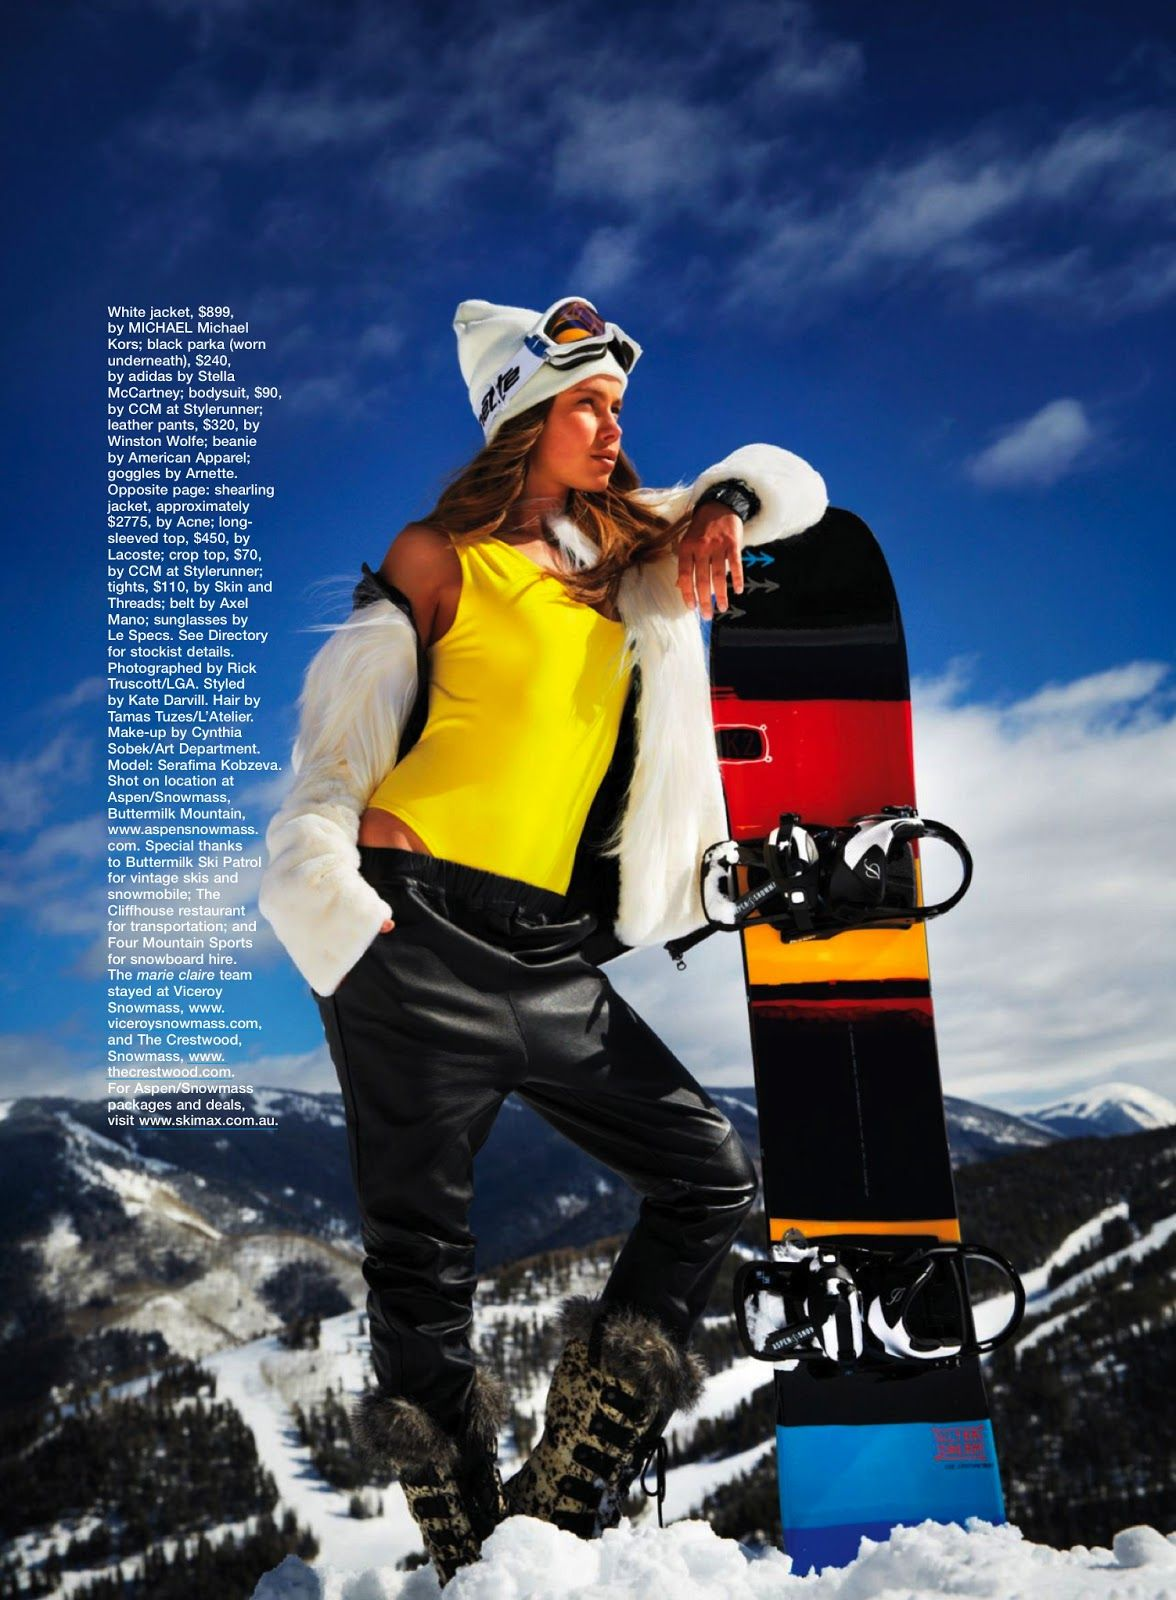 Ski Patrol Serafima Kobzeva By Rick Truscott For Marie Claire Australia July 2013 Visual Optim In 2020 Sports Fashion Editorial Marie Claire Australia Sport Fashion